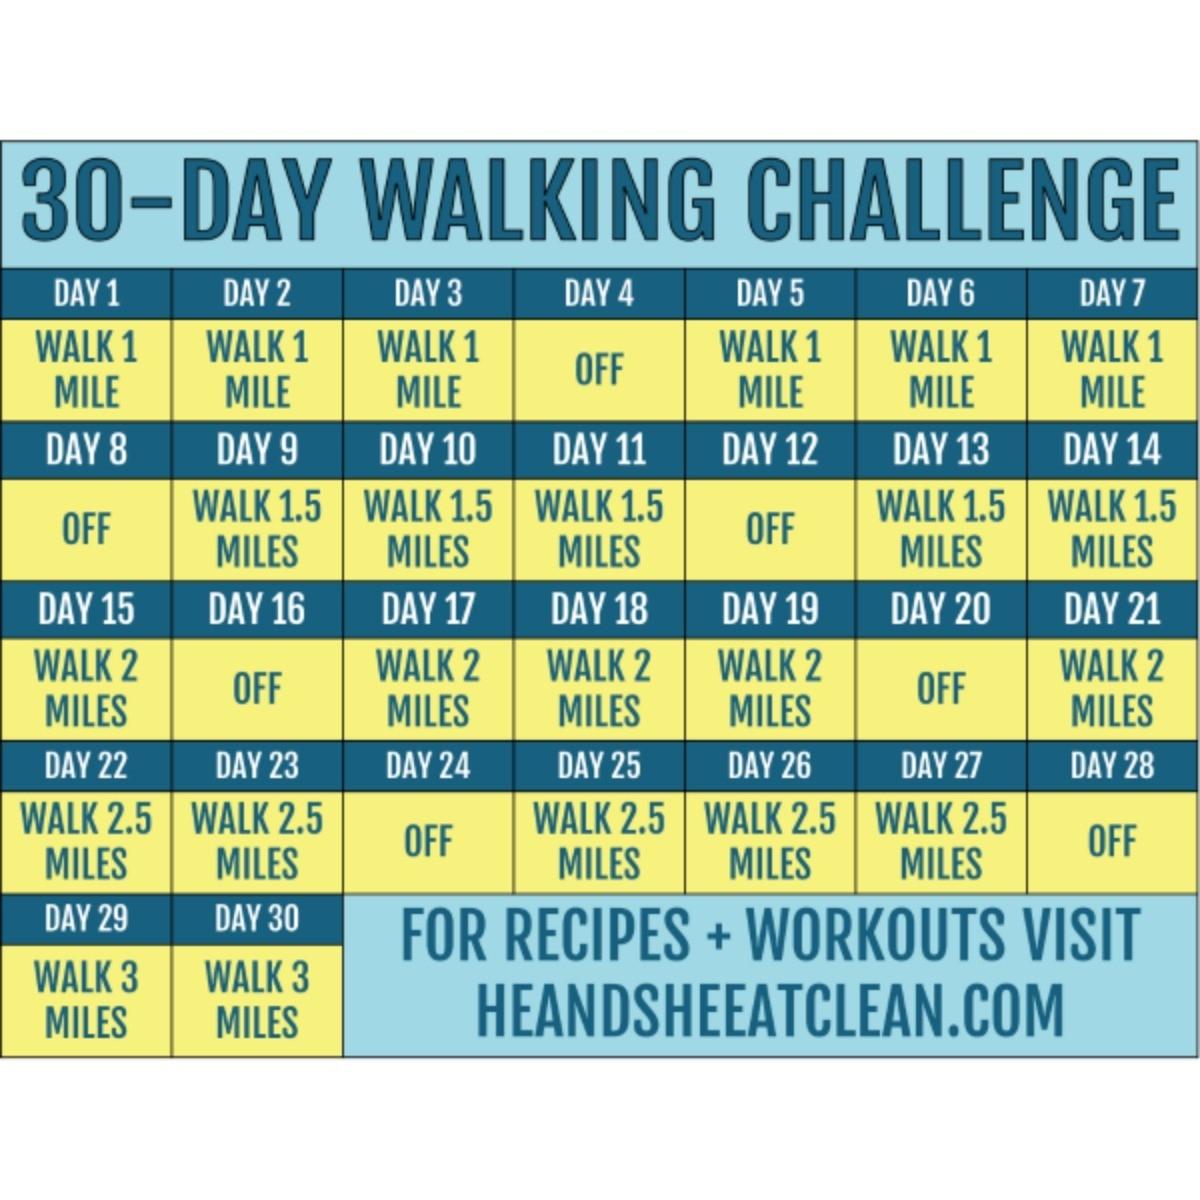 30-Day Walking Challenge With Printable Tracking Chart  Wellness Challenge Chart